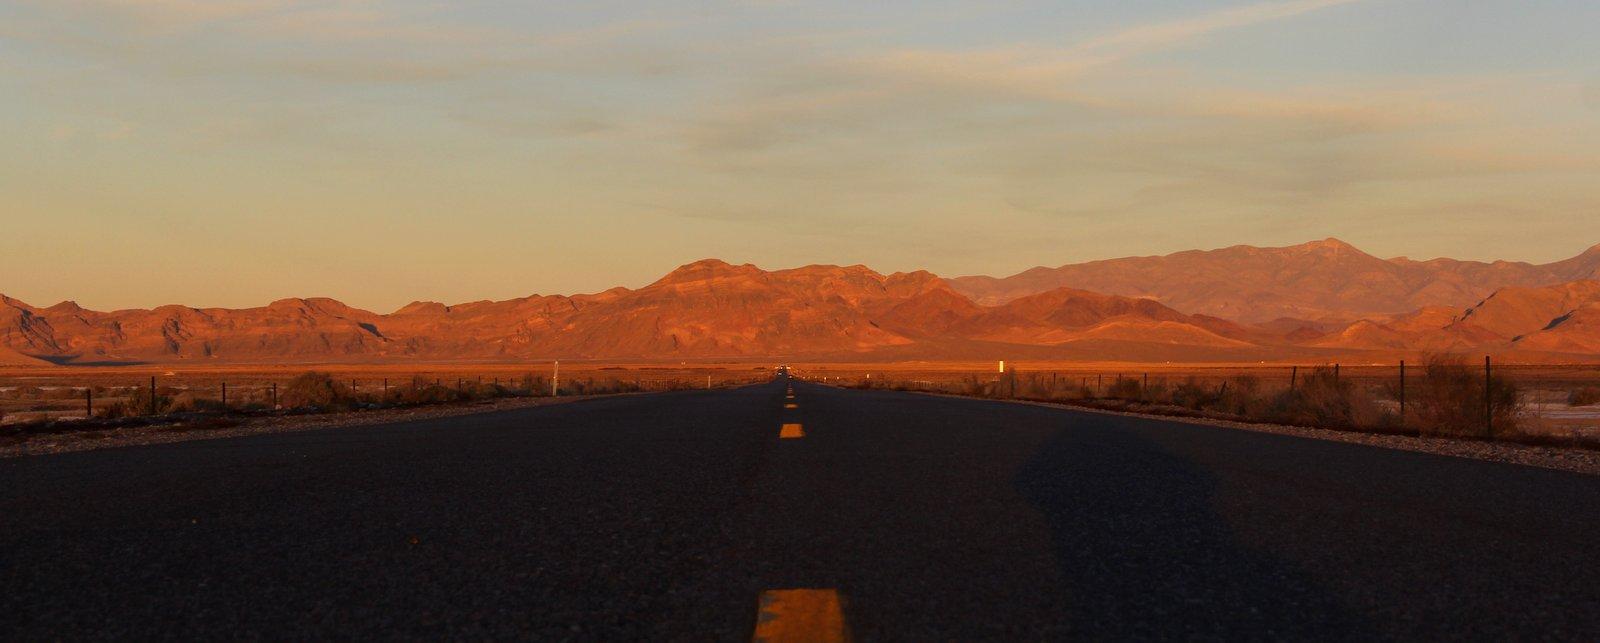 Dolina_Smierci_Death_Valley_Nevada_photo_photo_2455